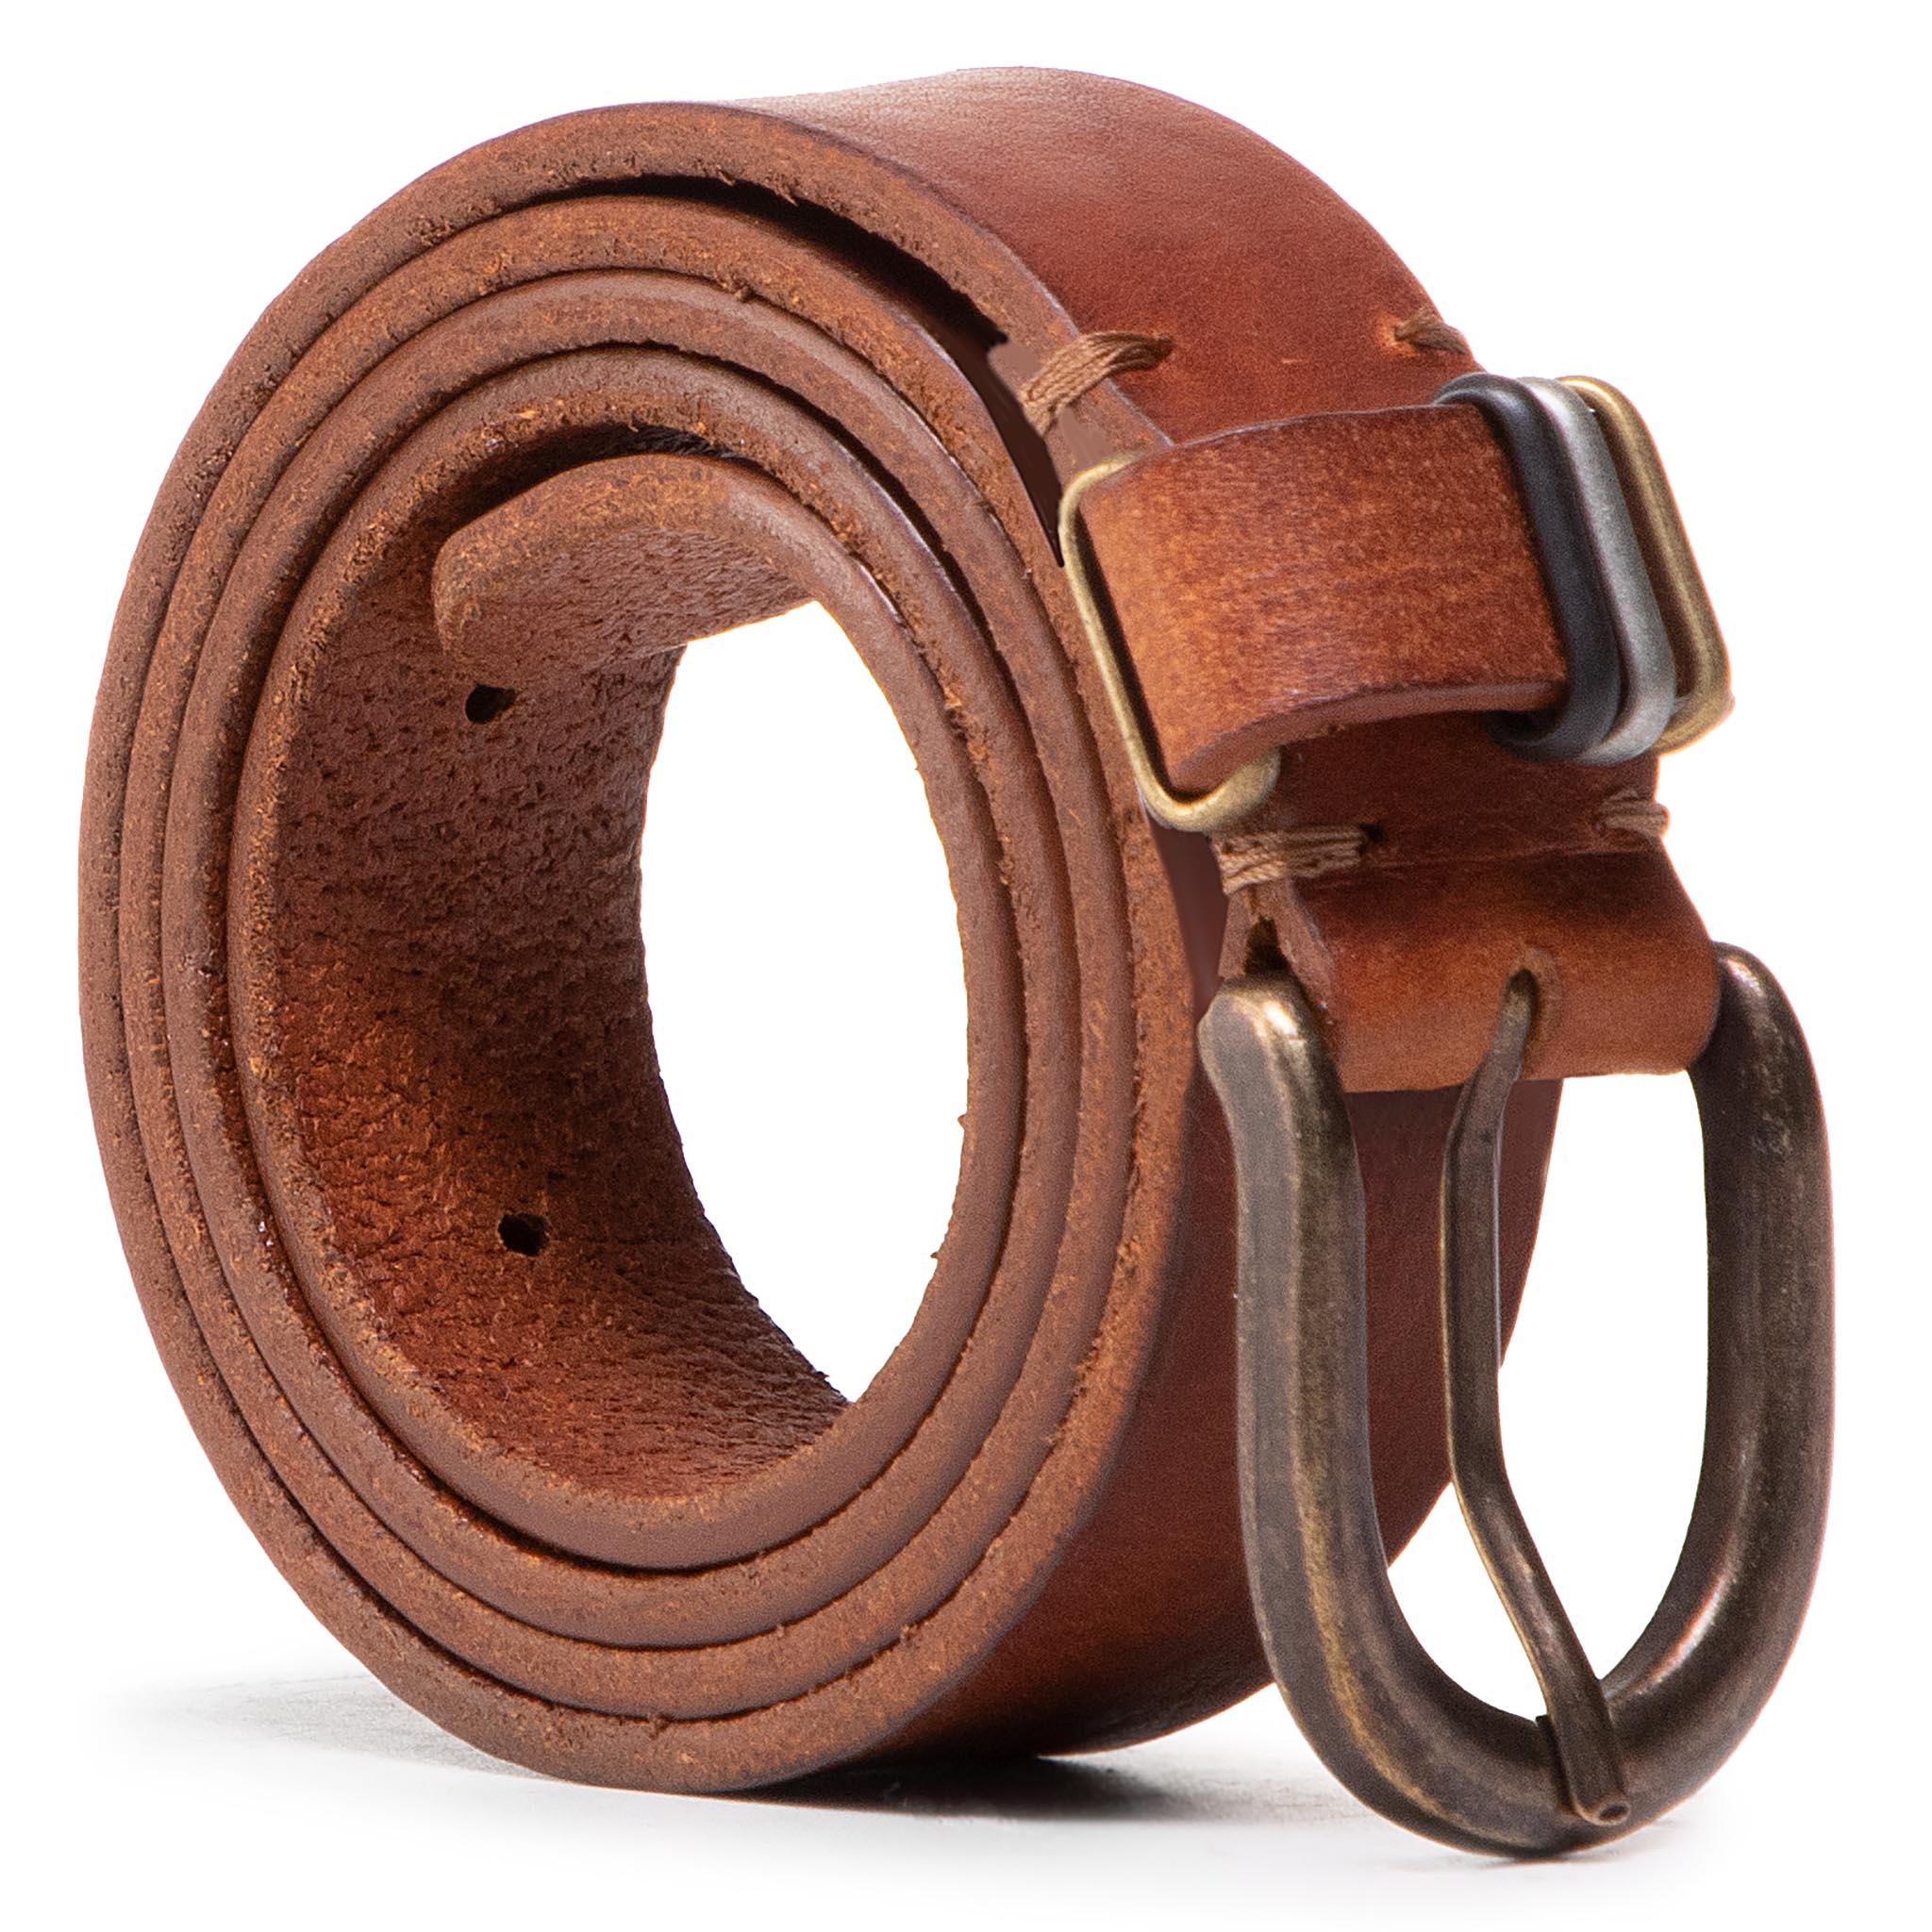 Cintura da donna WRANGLER - Loop Detail W0G9U1X81 Cognac